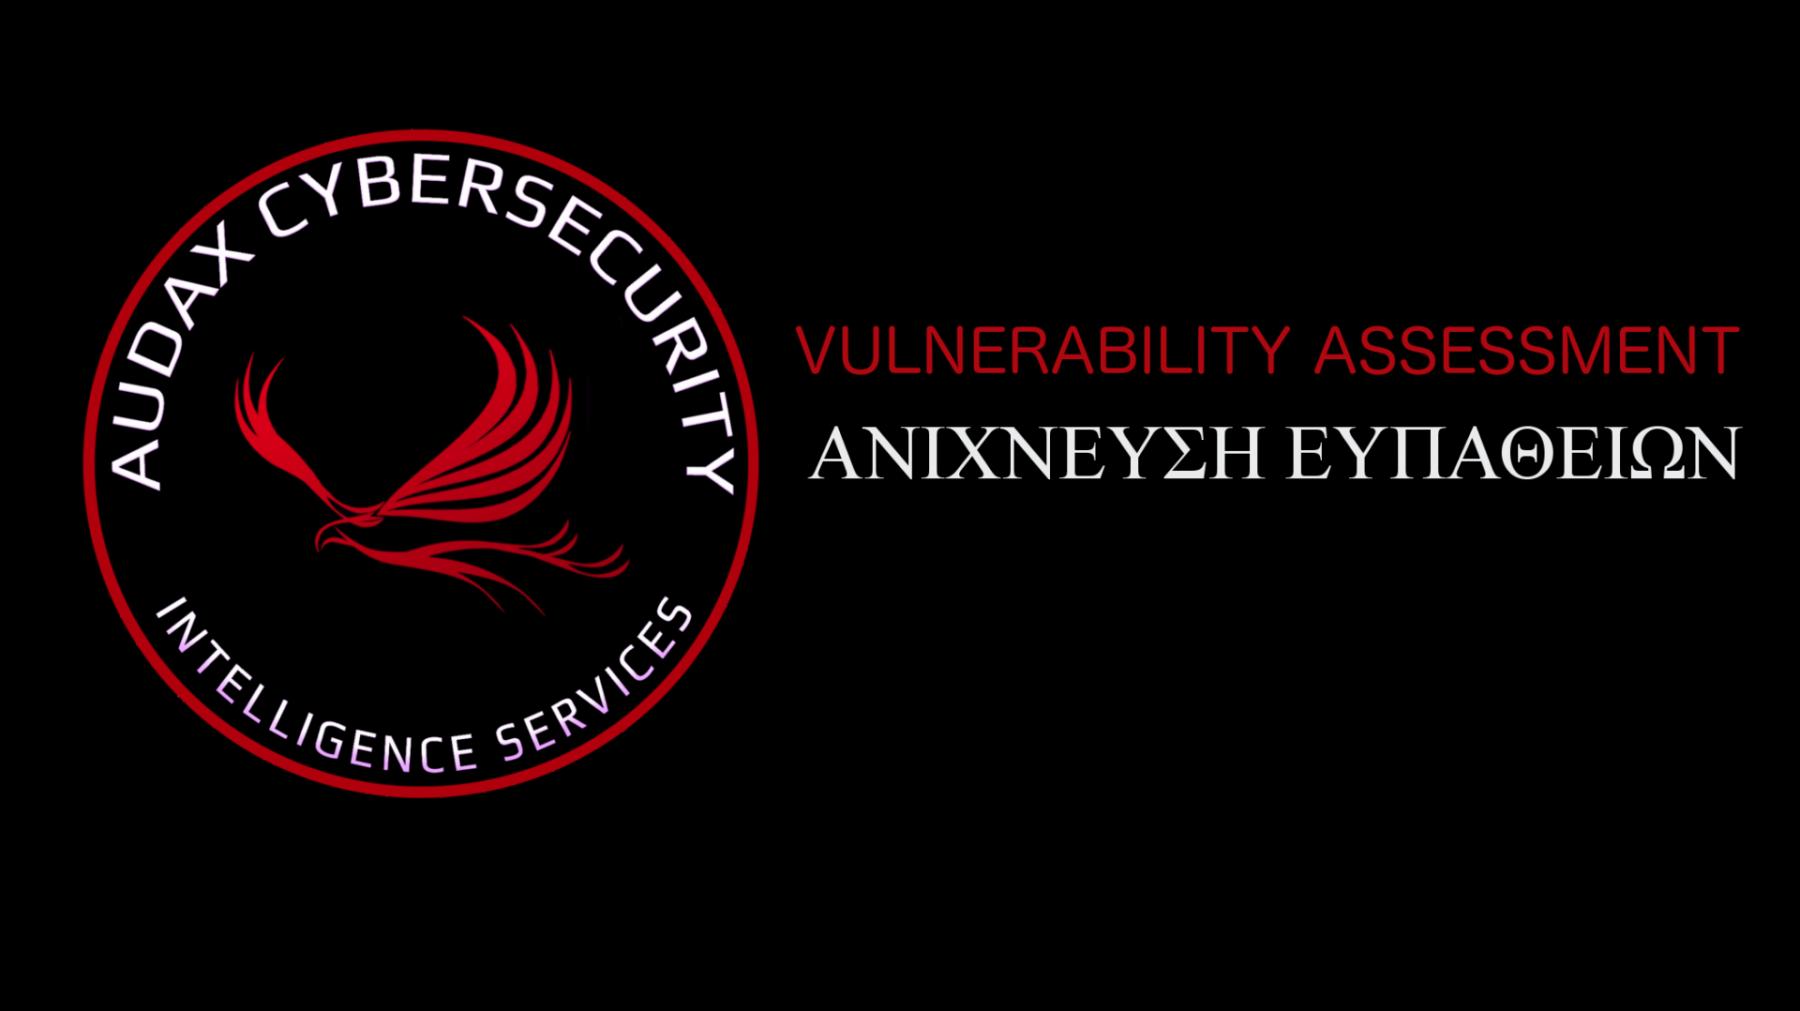 Vulnerability_Assessment-1920x1371